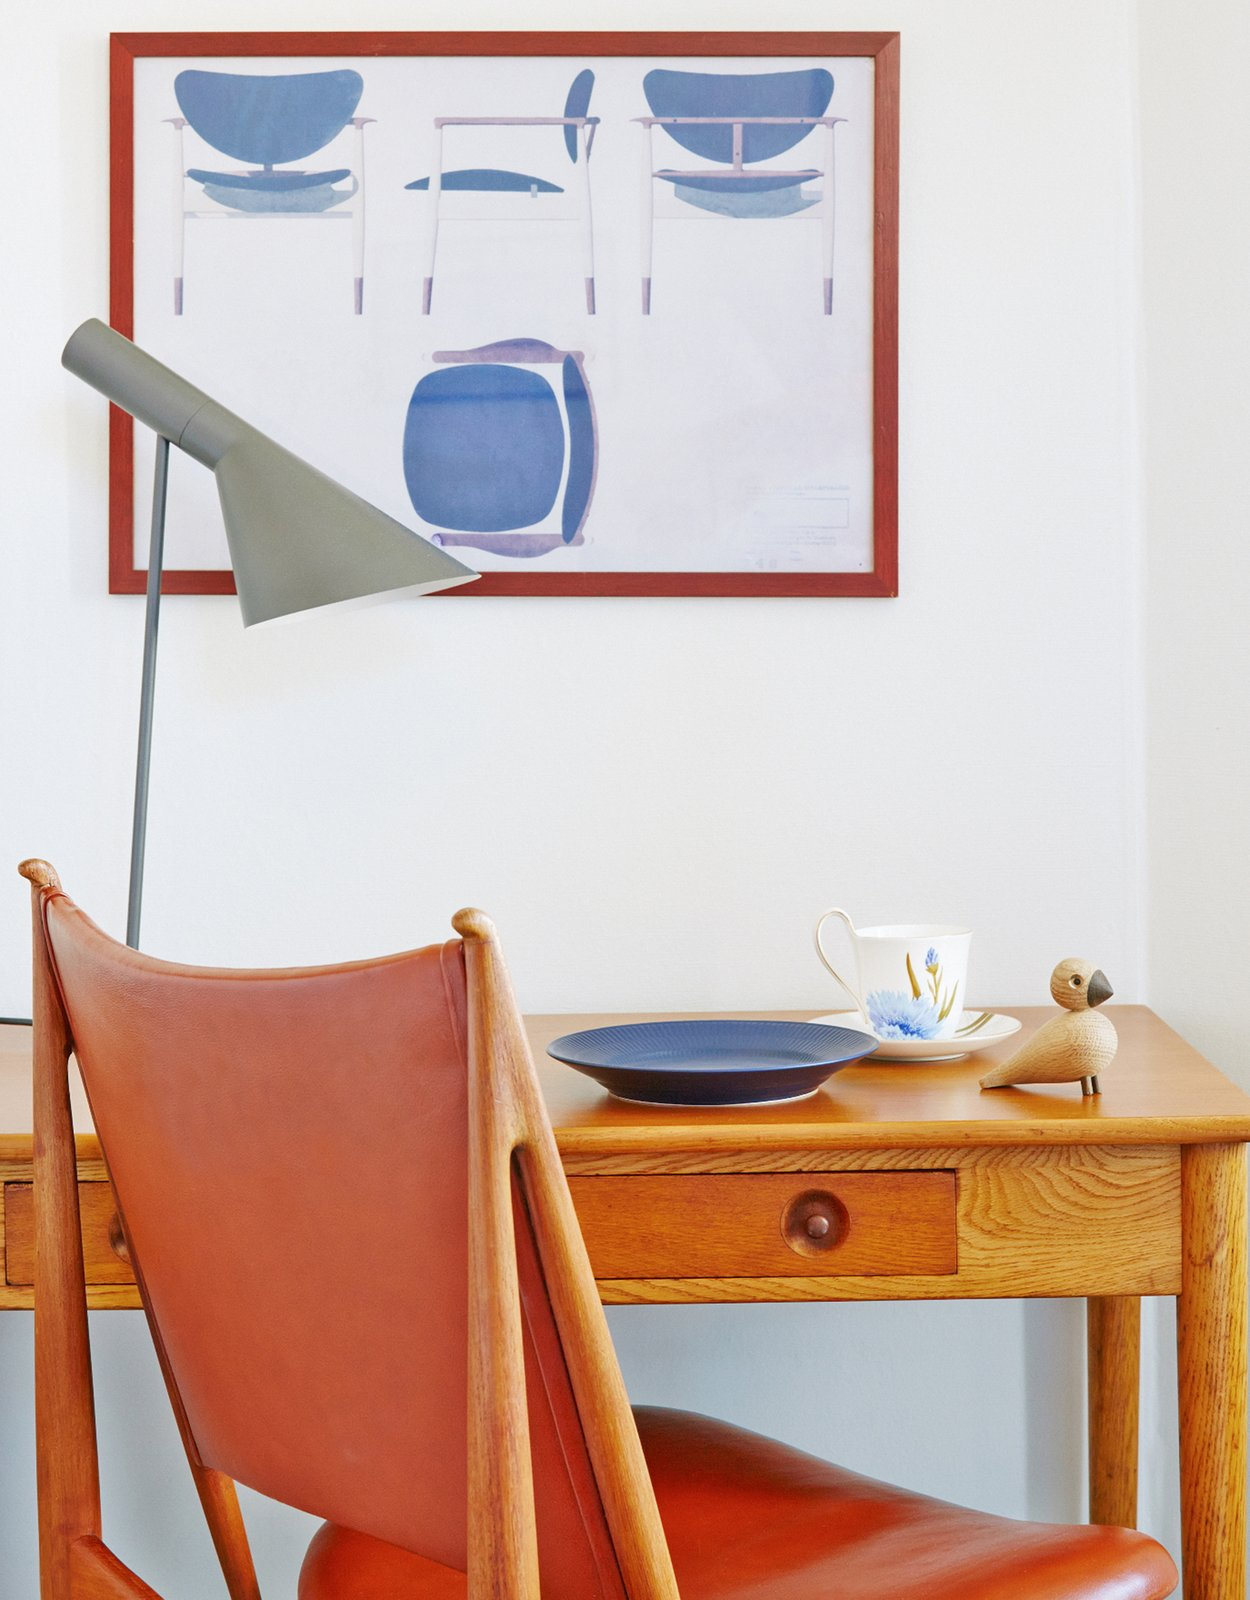 Office, Chair, Lamps, and Desk Finn Juhl Deluxe Room  Photo 6 of 9 in Get Your Fix of Midcentury Scandinavian Design at This Copenhagen Hotel